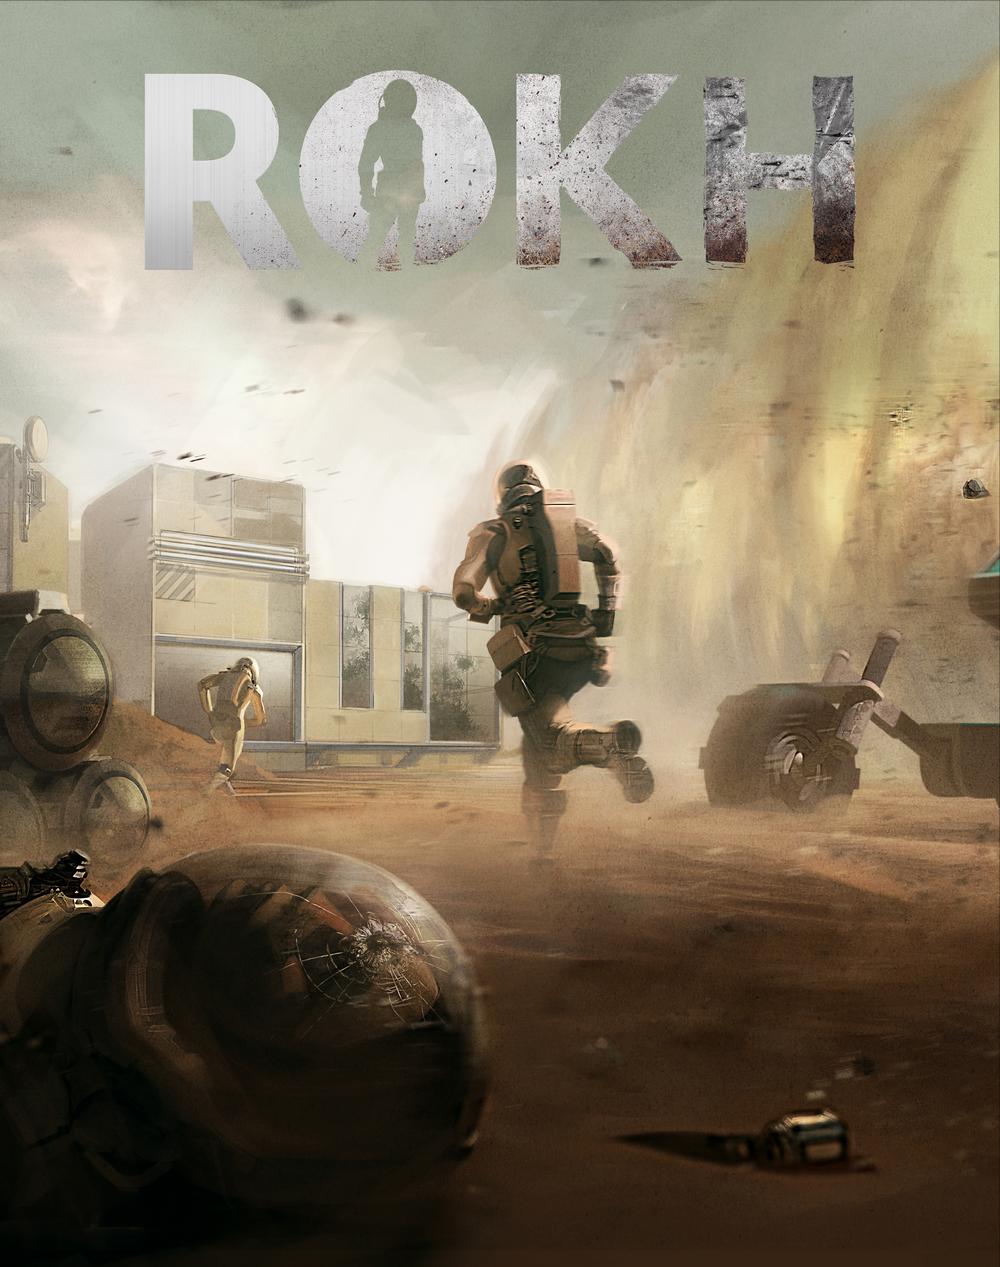 rokh 01